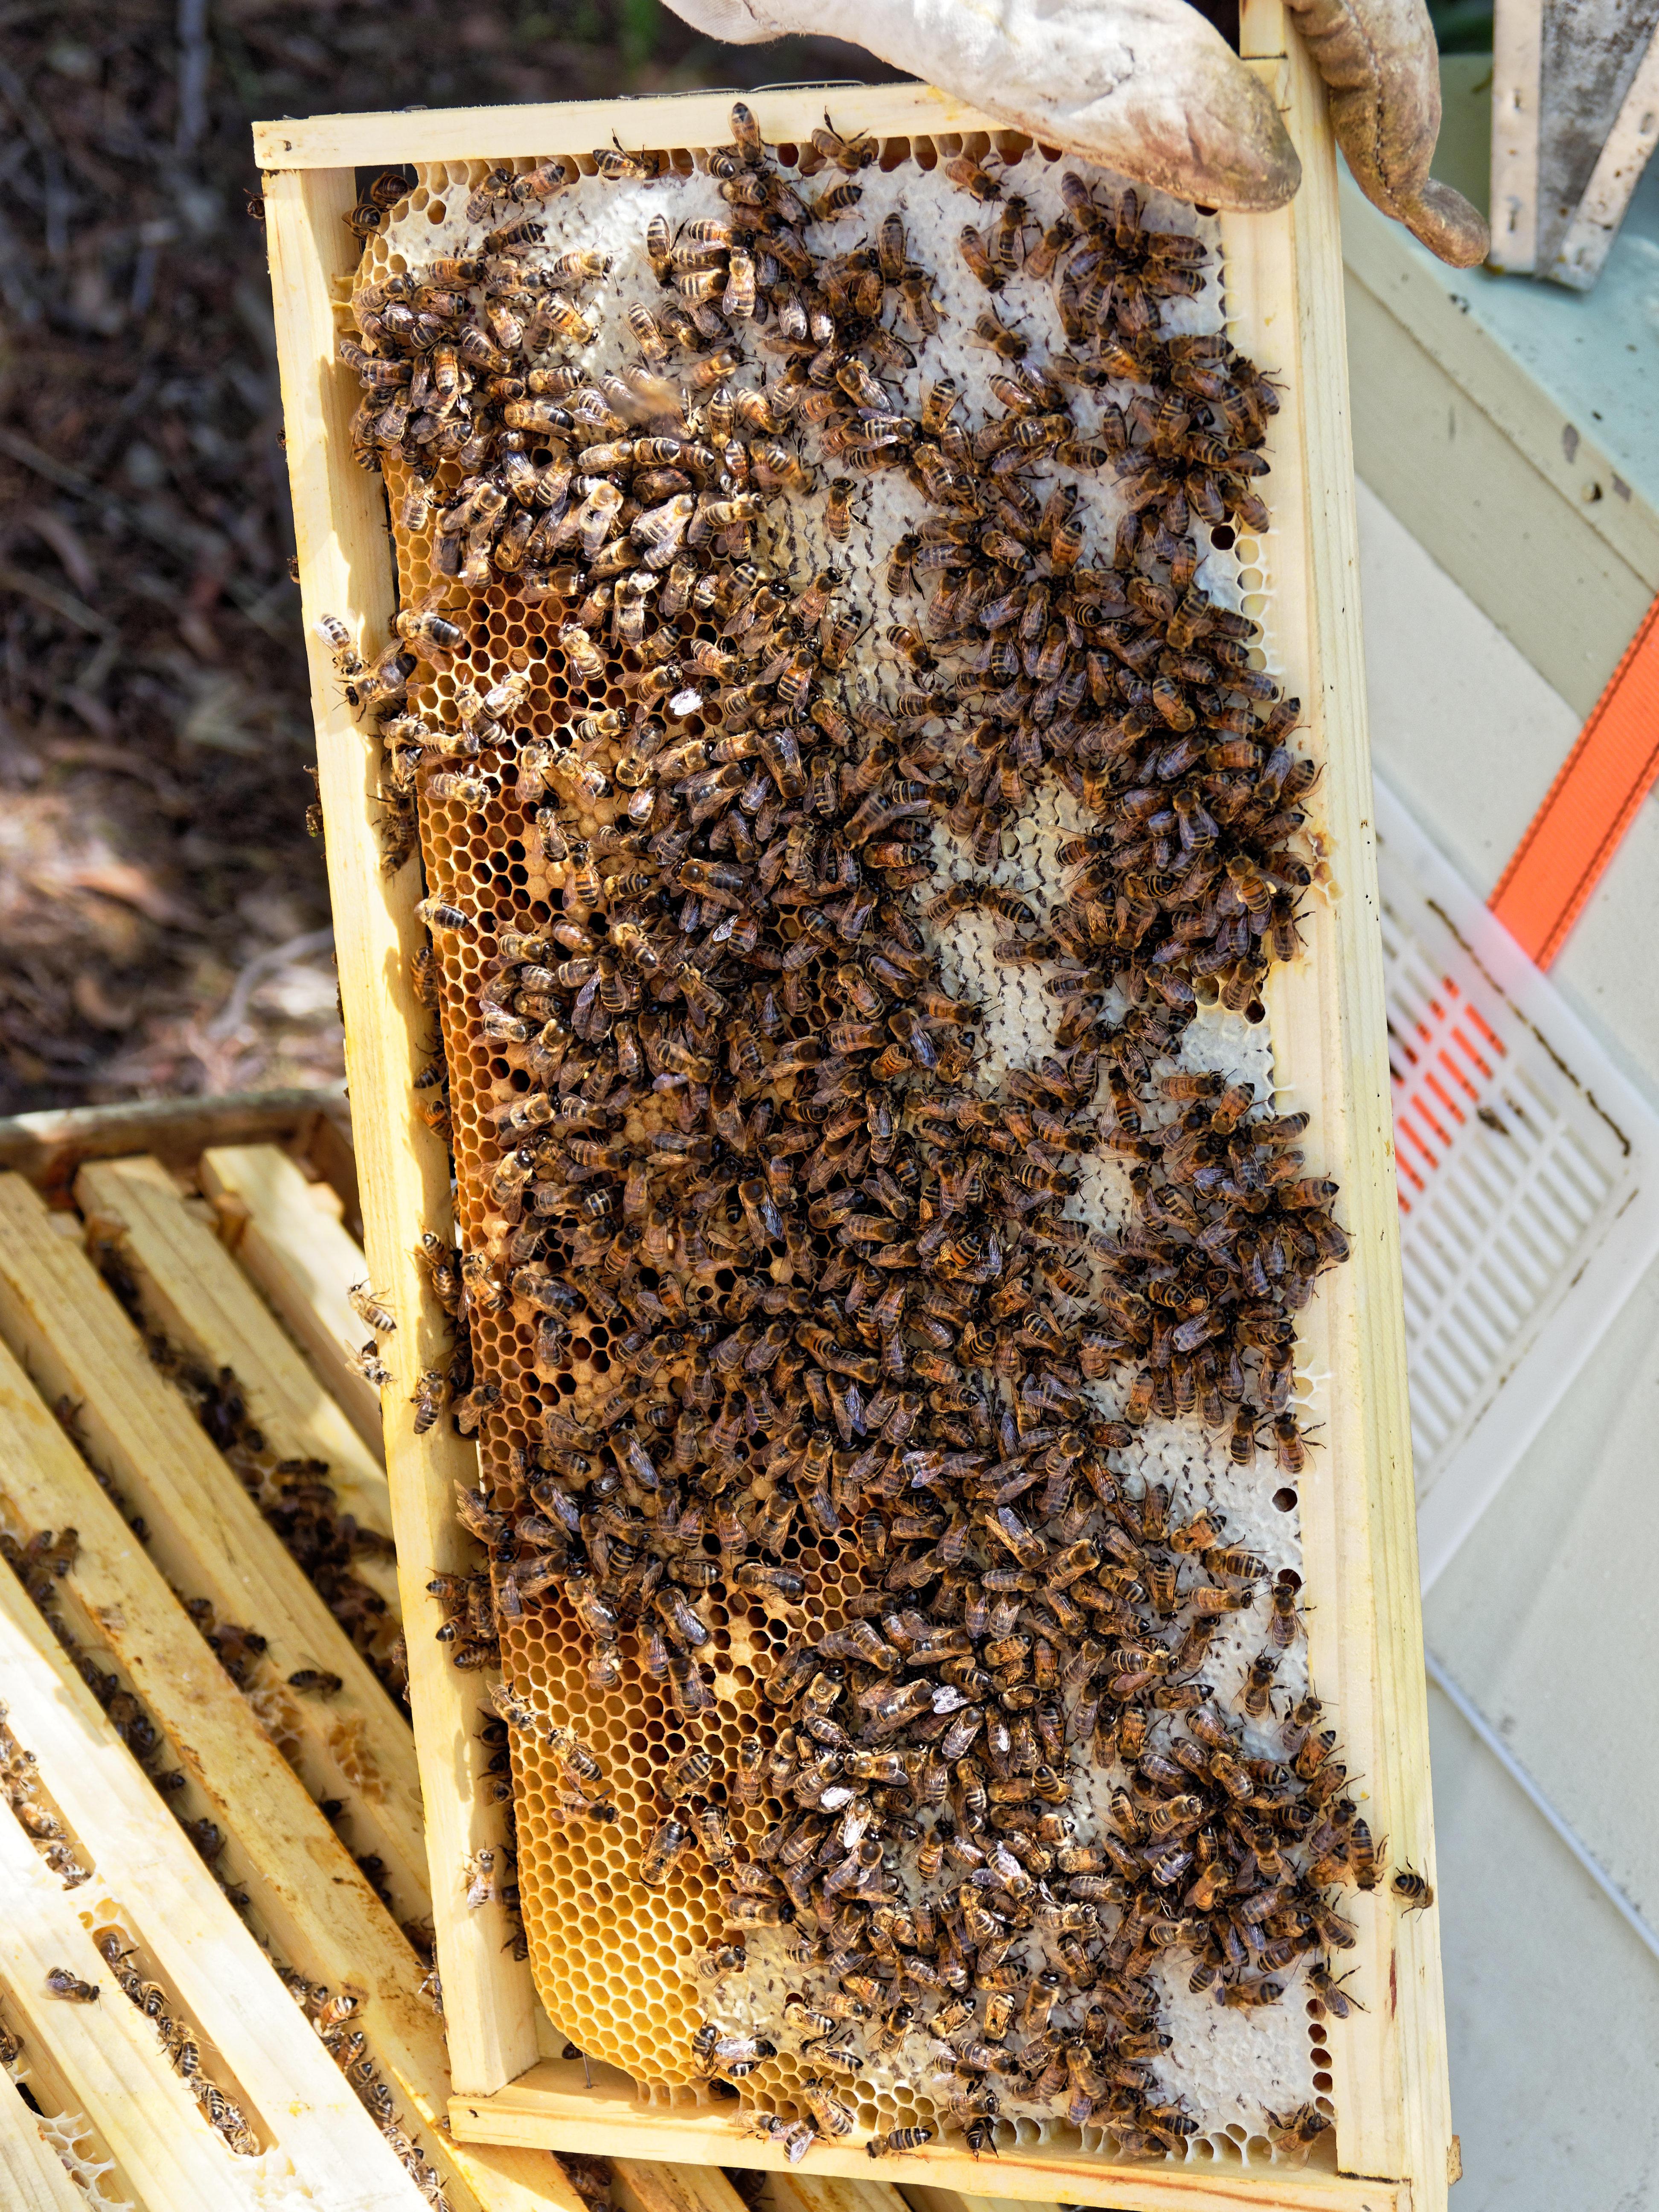 Inspecting-beehives-46.jpeg